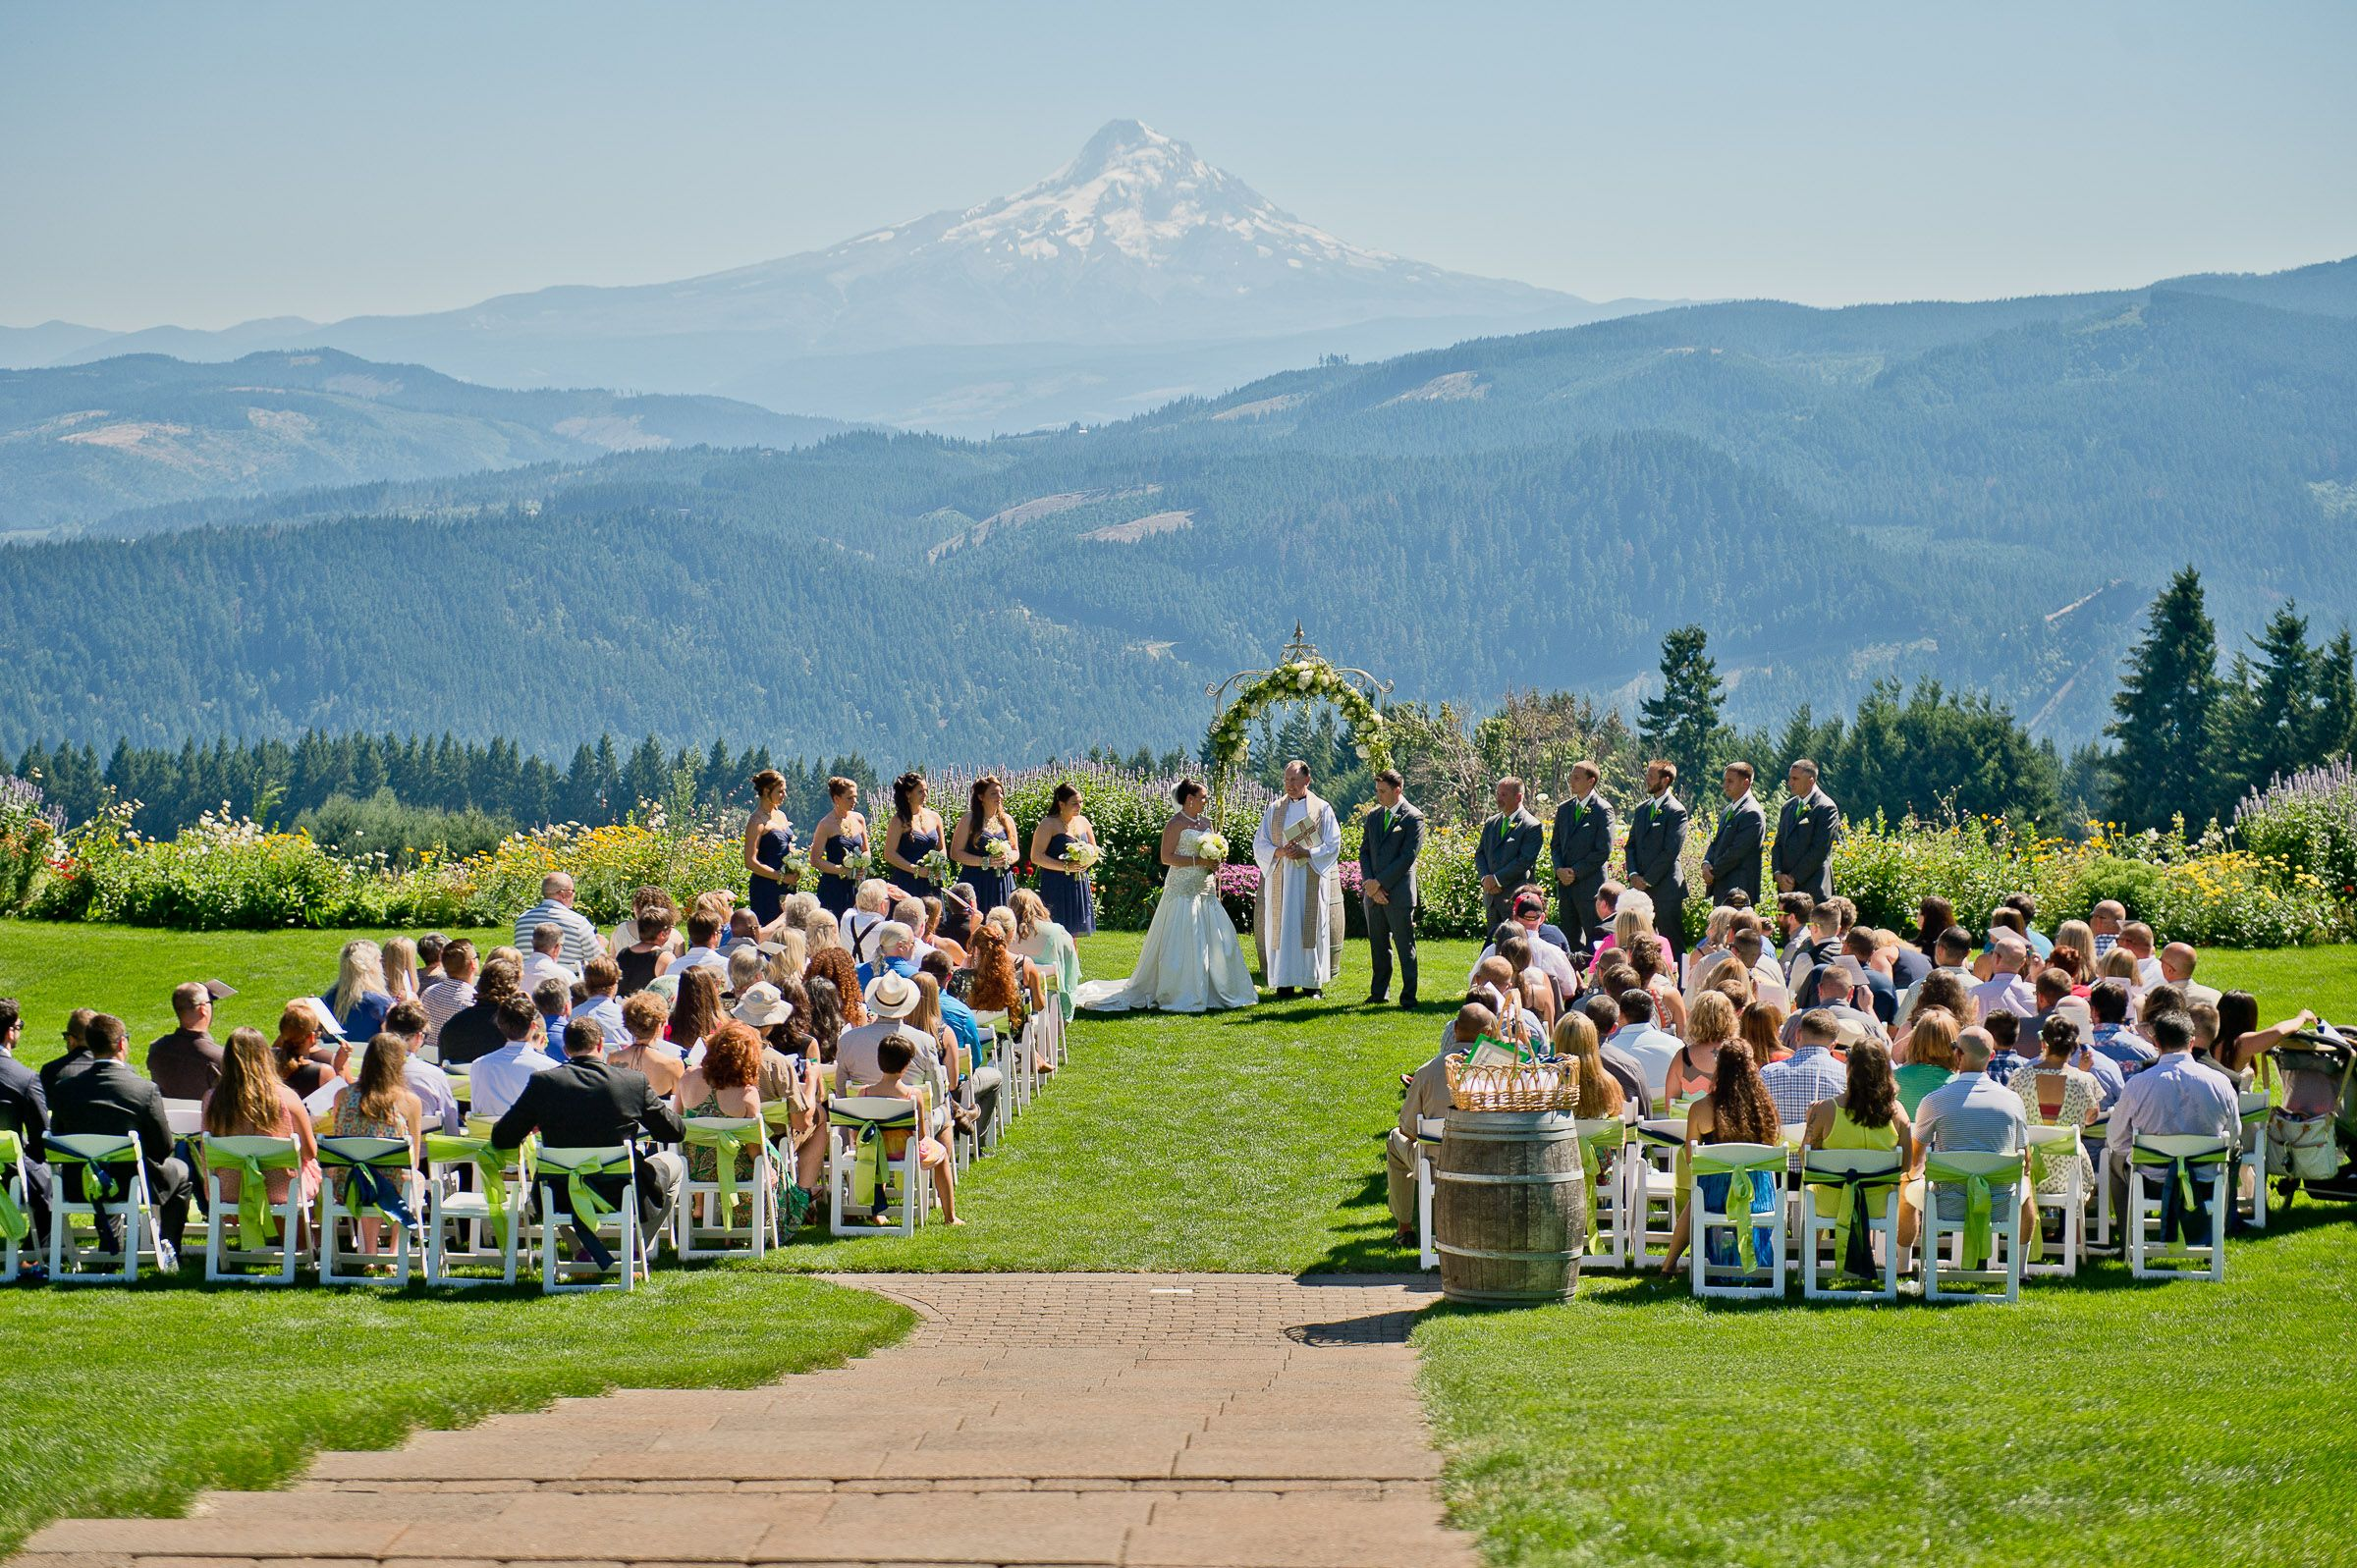 mountain view wedding venues washington